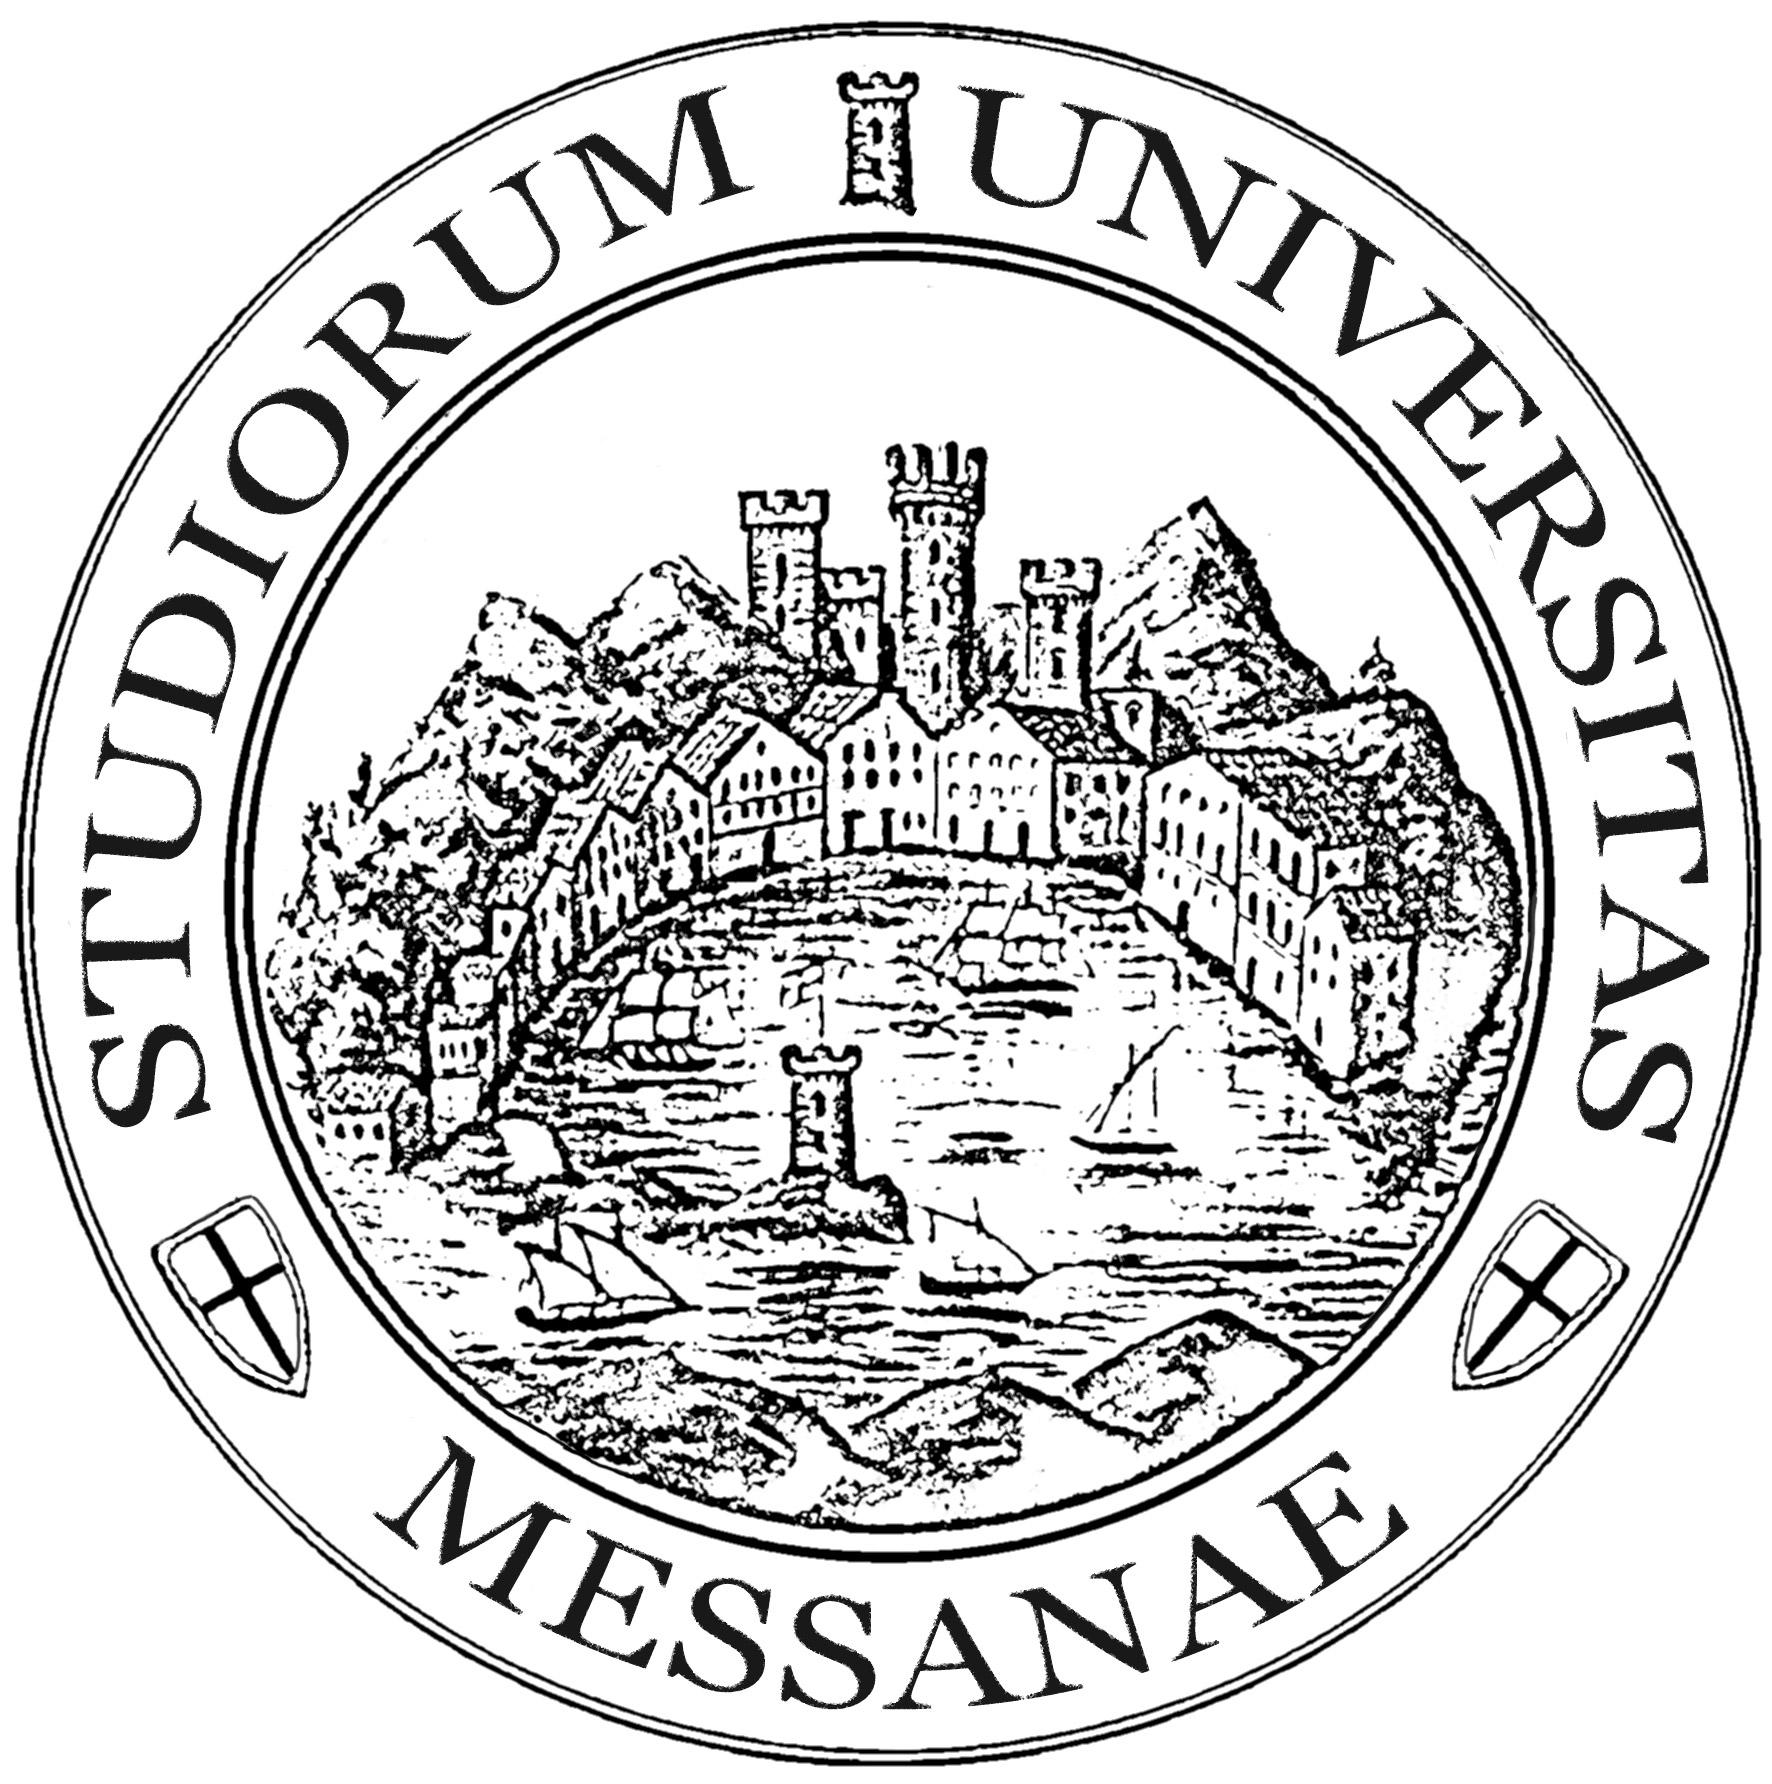 Università di Messina. Dip. Cospecs (Cognitive Sciences, Psychology,Education and Cultural Studies)